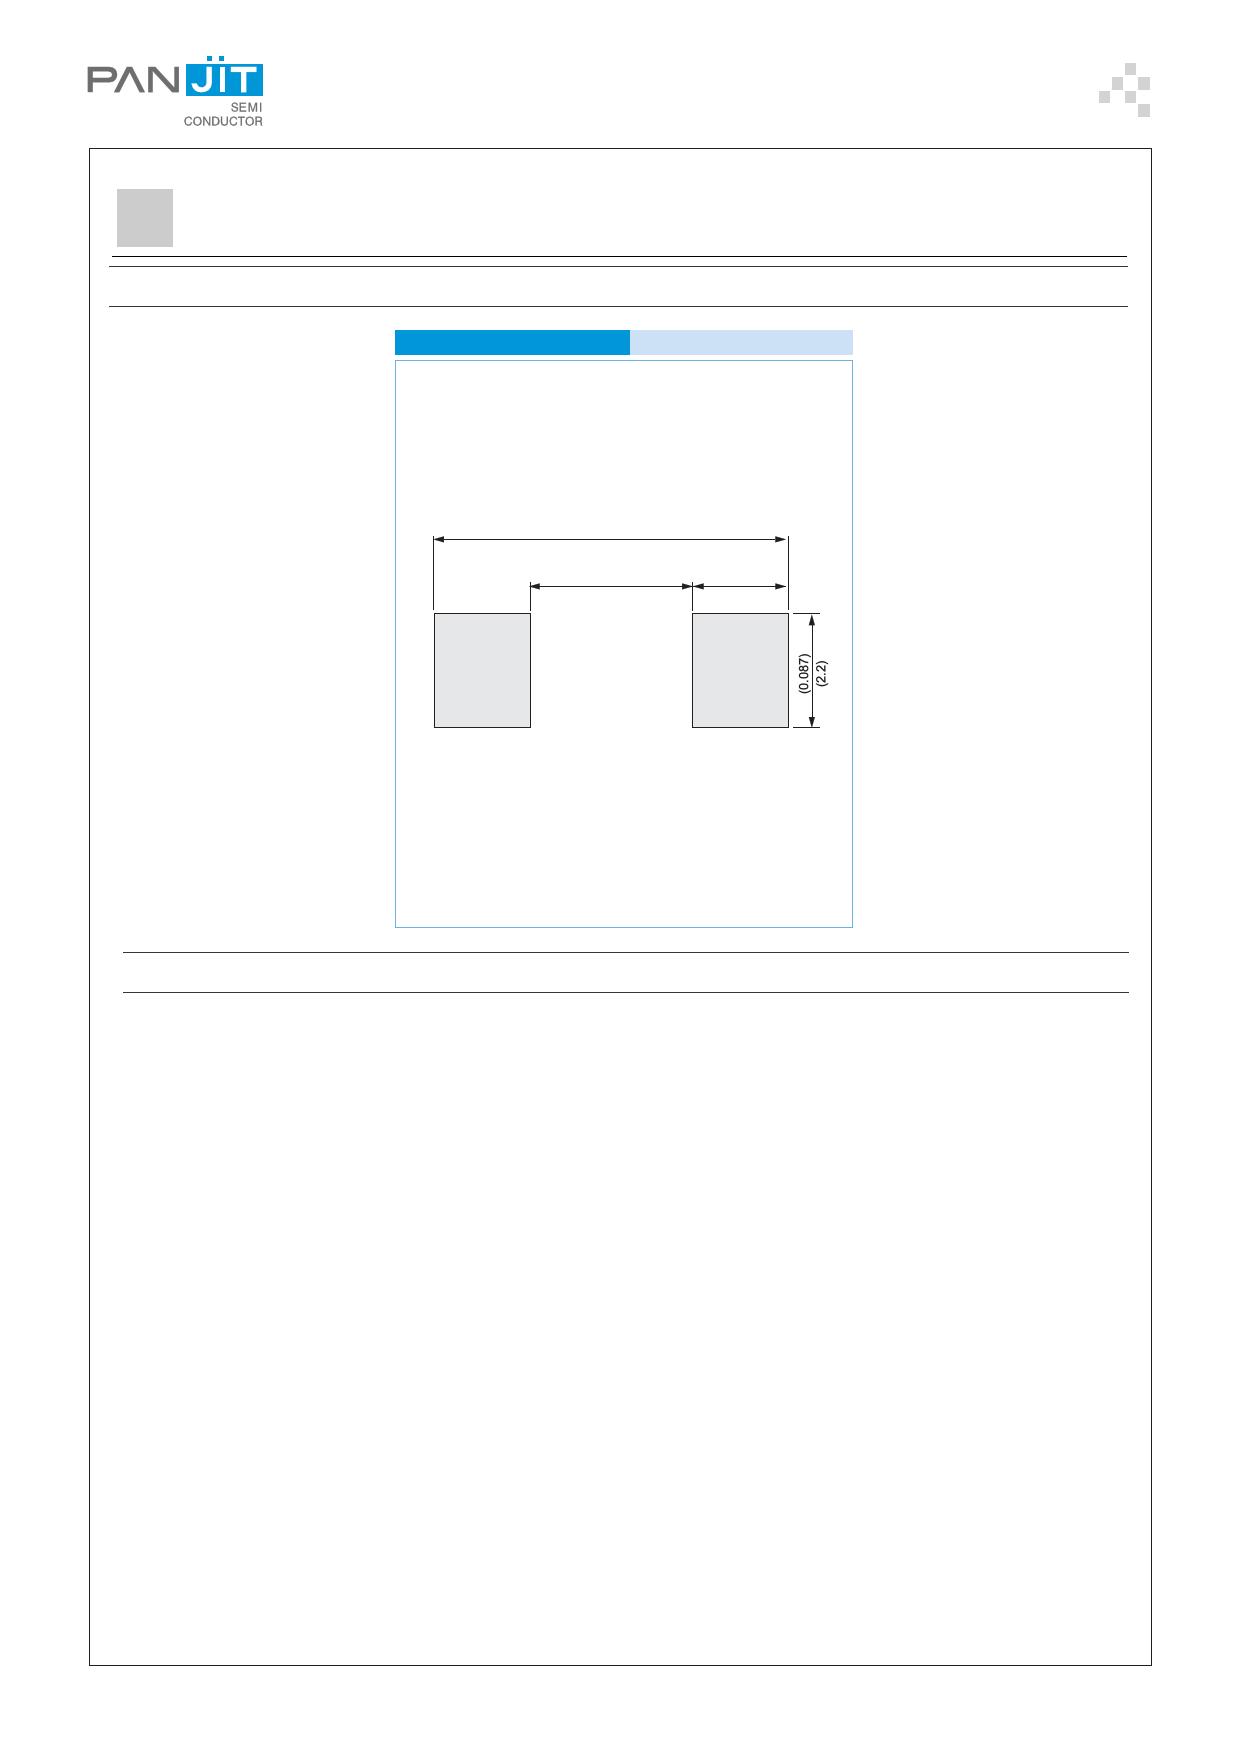 UF2BF pdf, 반도체, 판매, 대치품